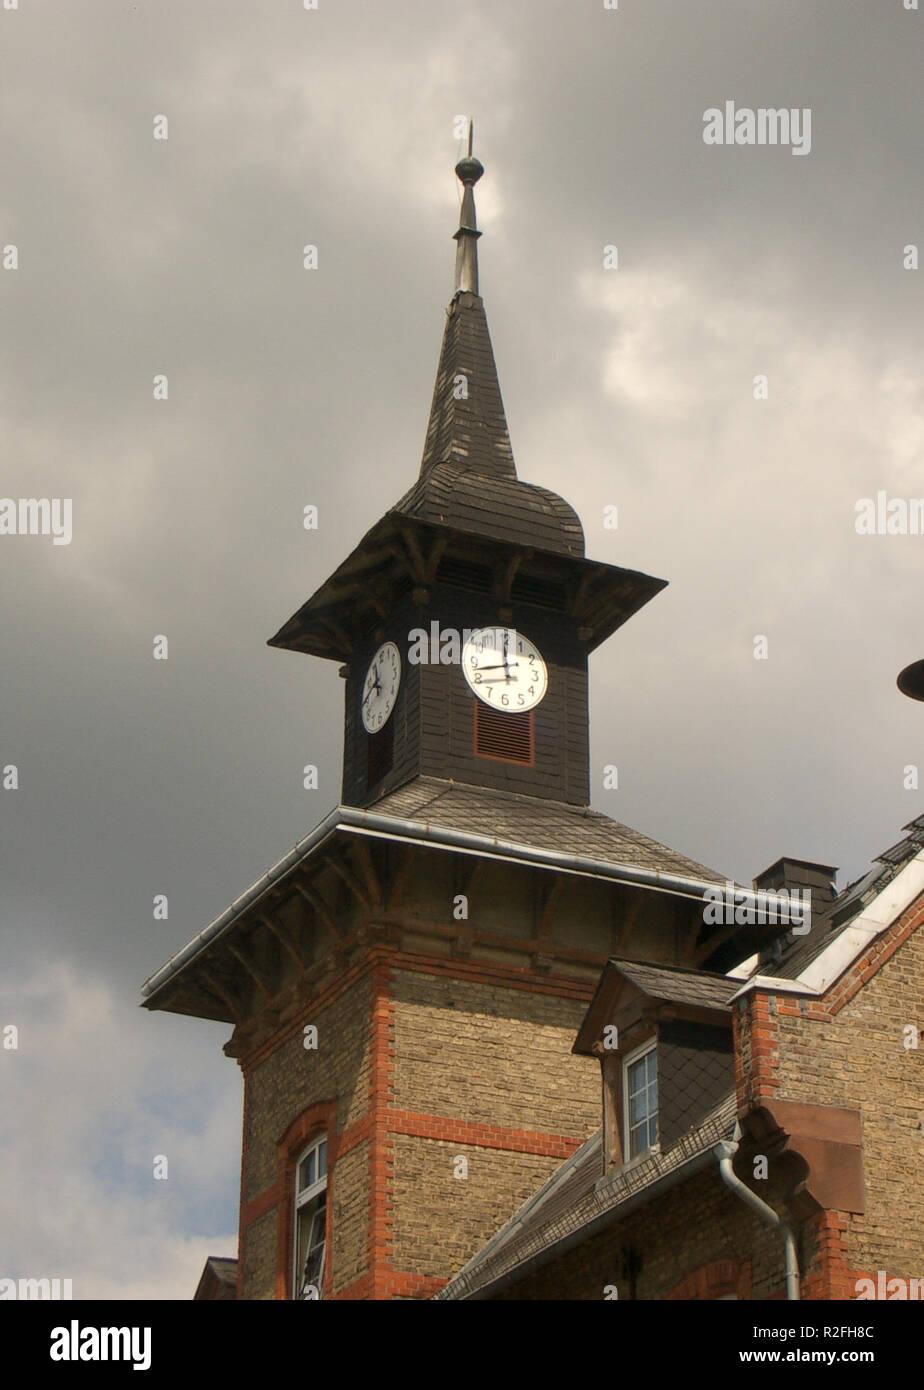 clock tower 81-56 - Stock Image